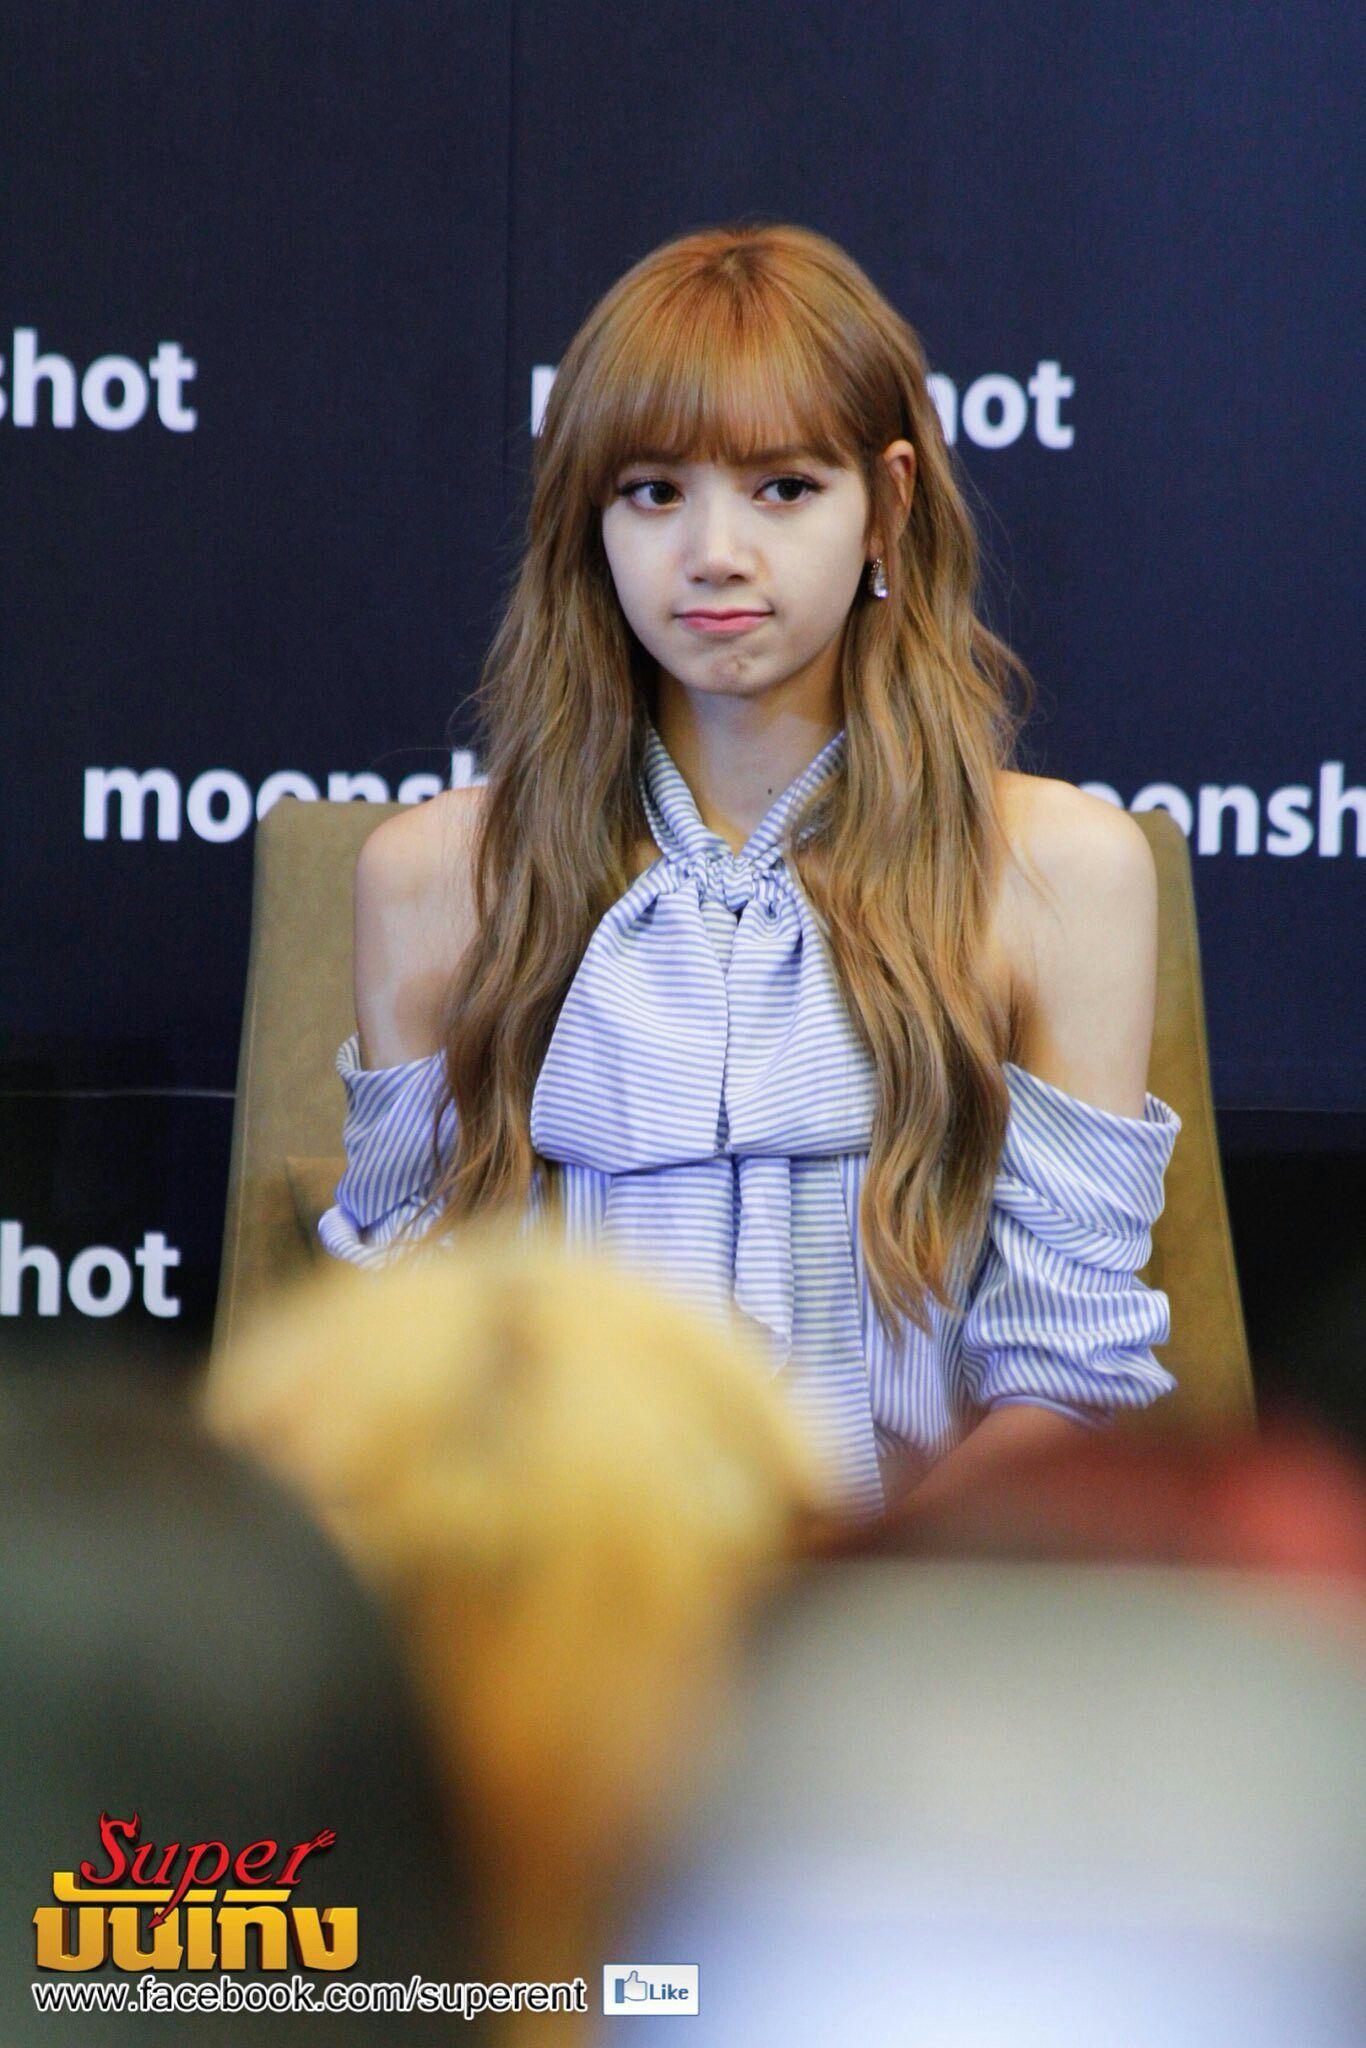 Her Cute Pout Entertainment Kim Idol